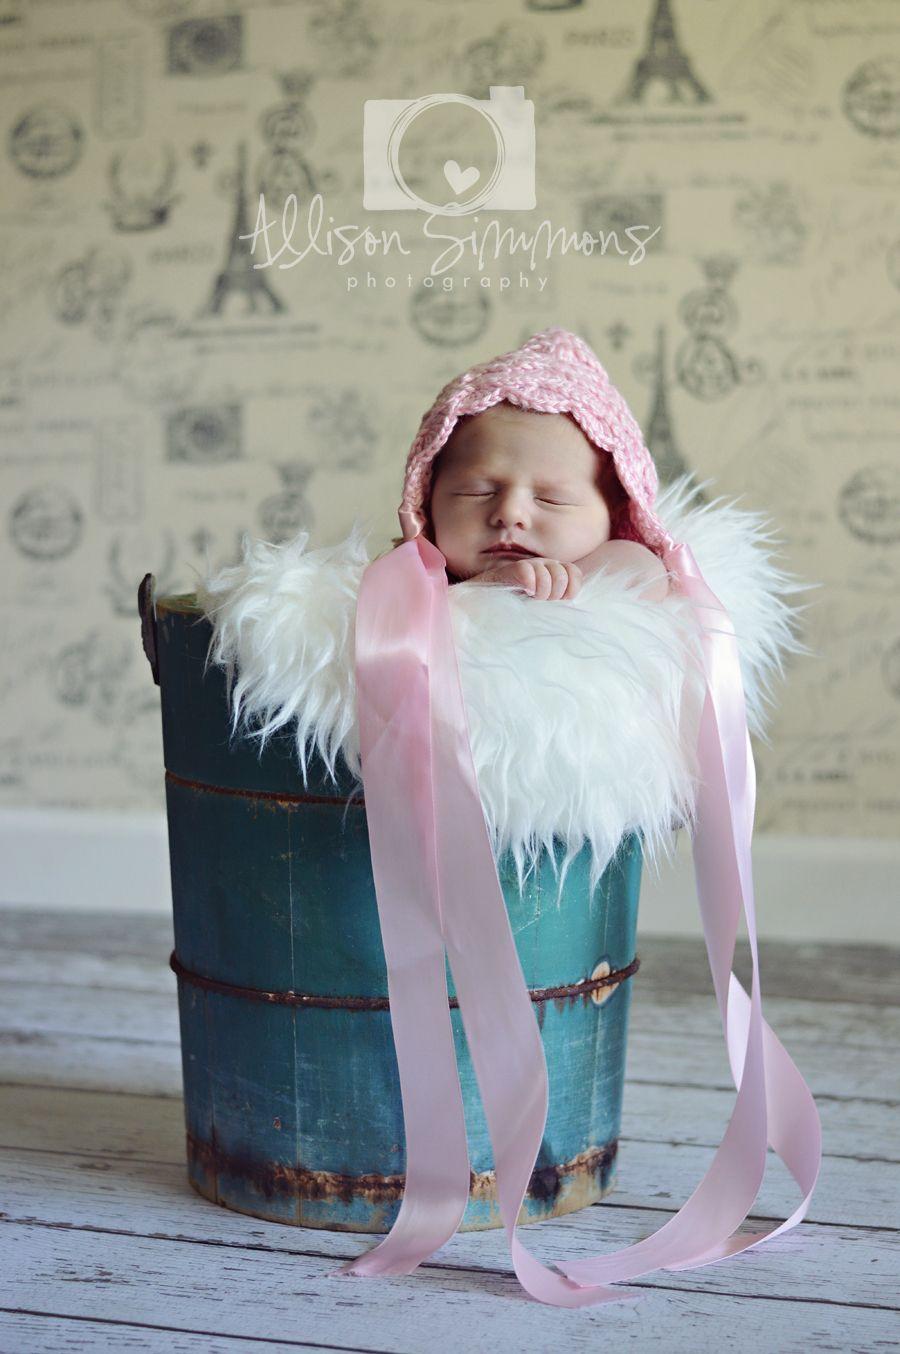 Newborn photography, crochet pixie hat, ribbon, Paris backdrop, newborn in bucket, antique ice cream make, newborn pose, baby, newborn girl, ideas, natural light photography, ASP, Allison Simmons Photography